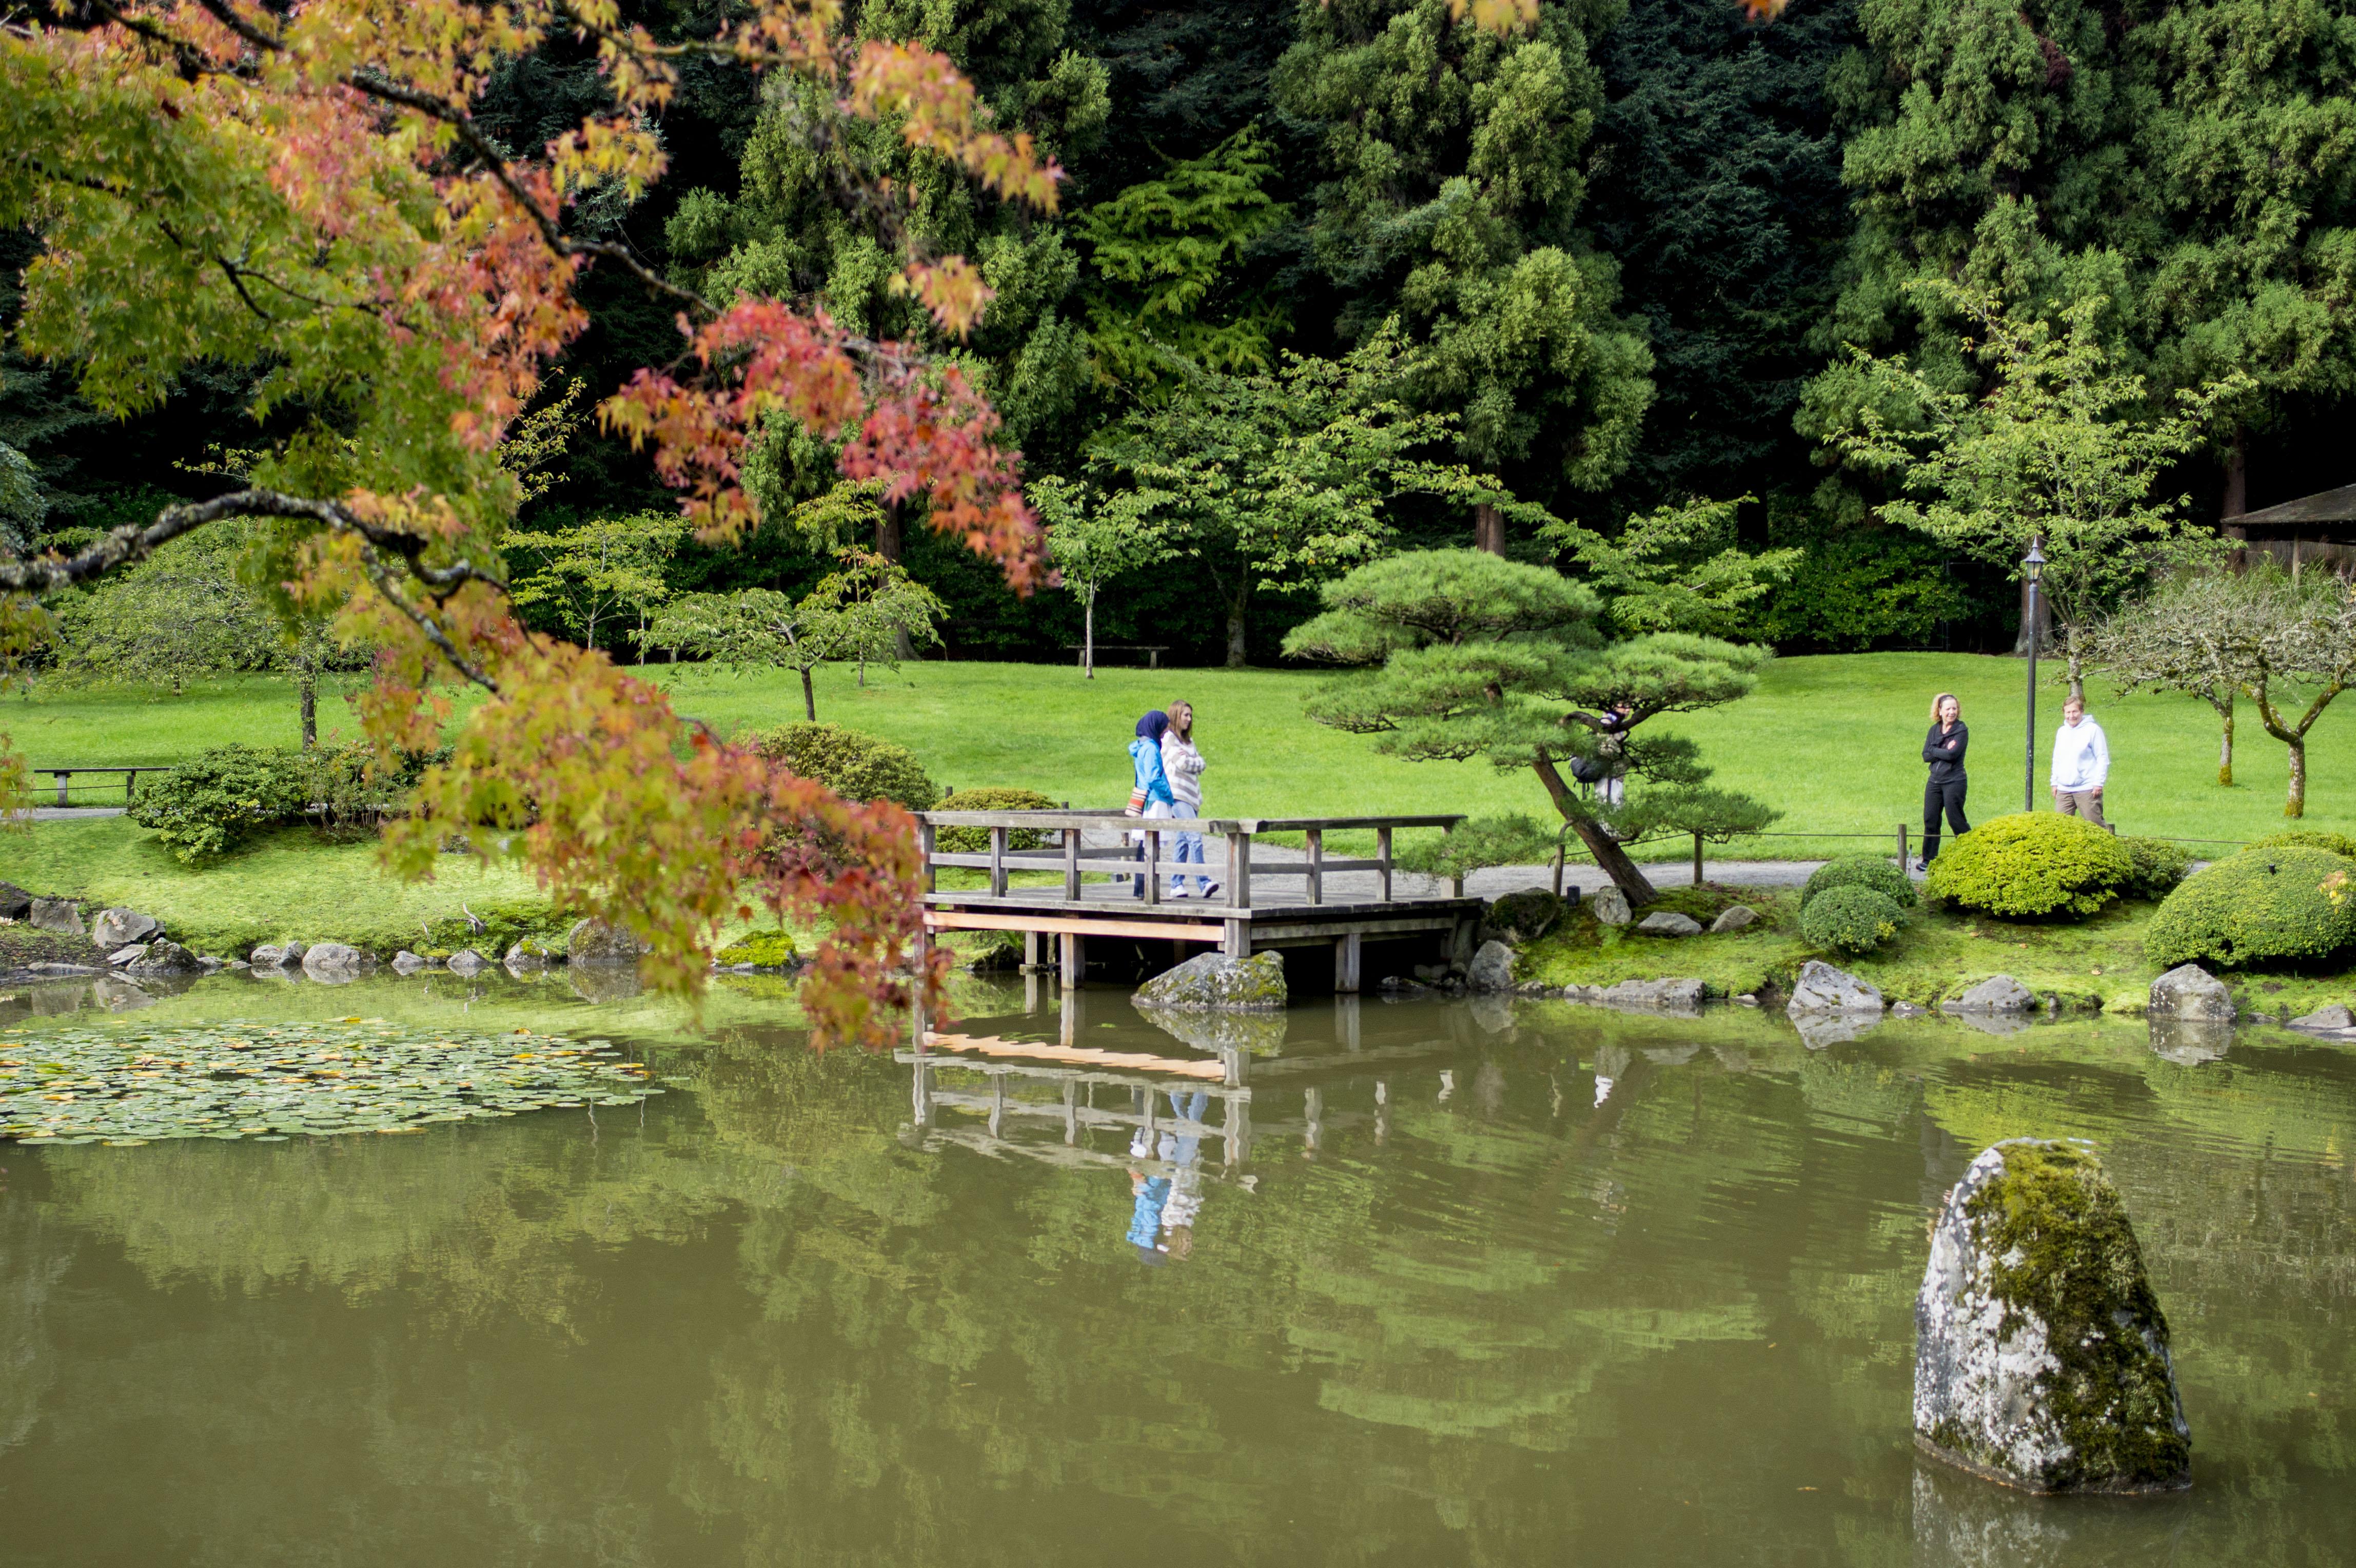 2014 Seattle Japanese Garden Maple Viewing Festival (15552021022).jpg